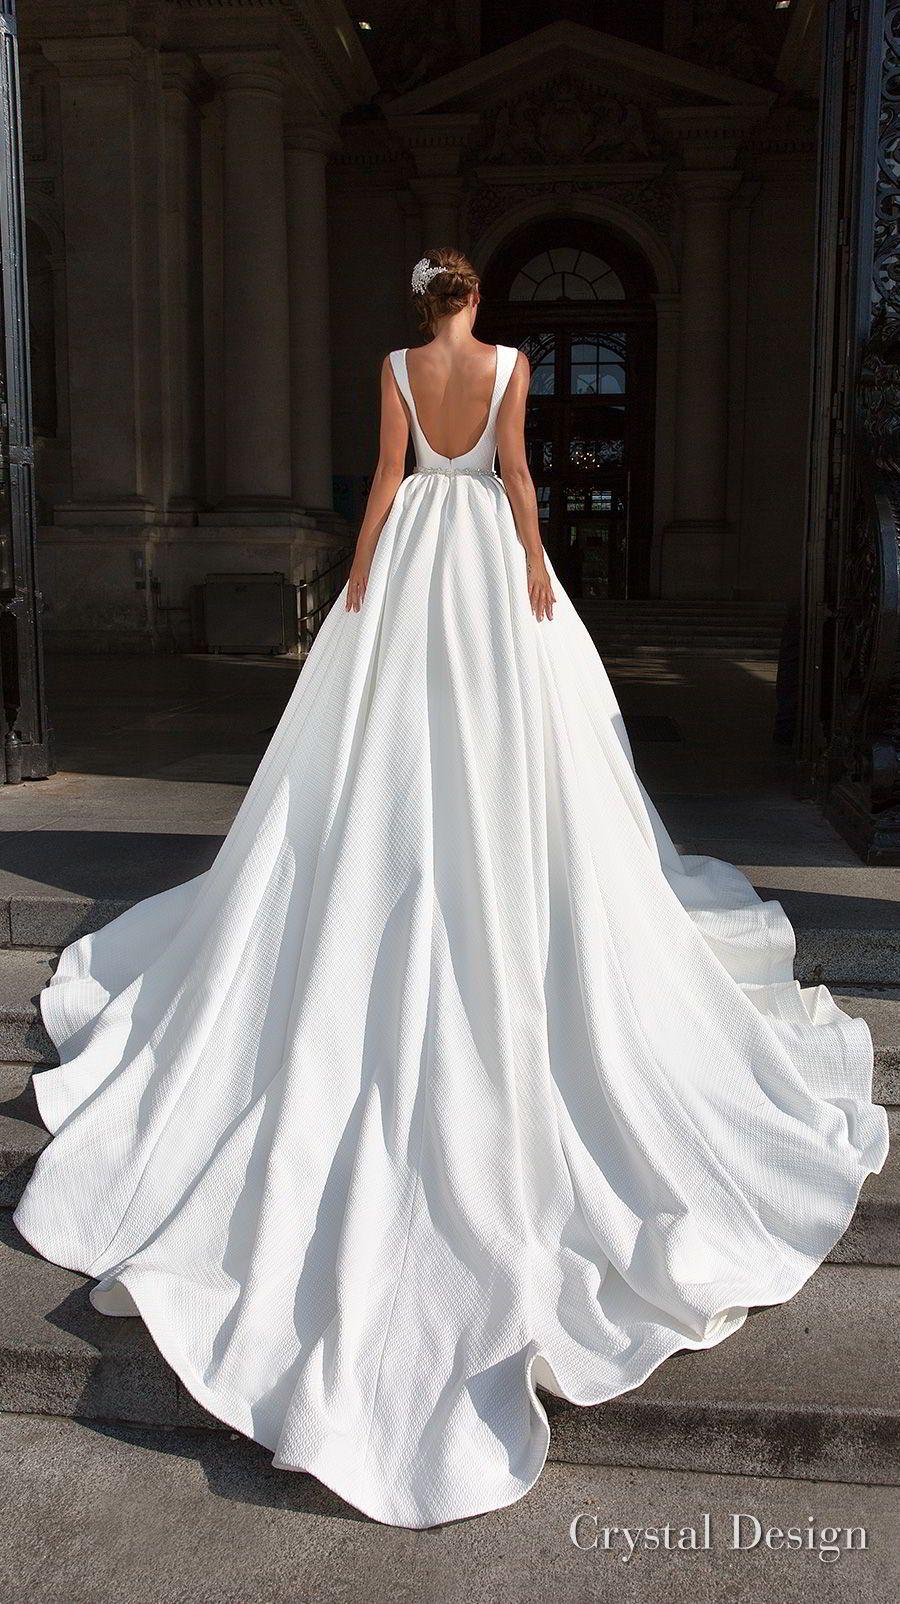 Crystal design wedding dresses u ucroyal gardenud u haute couture